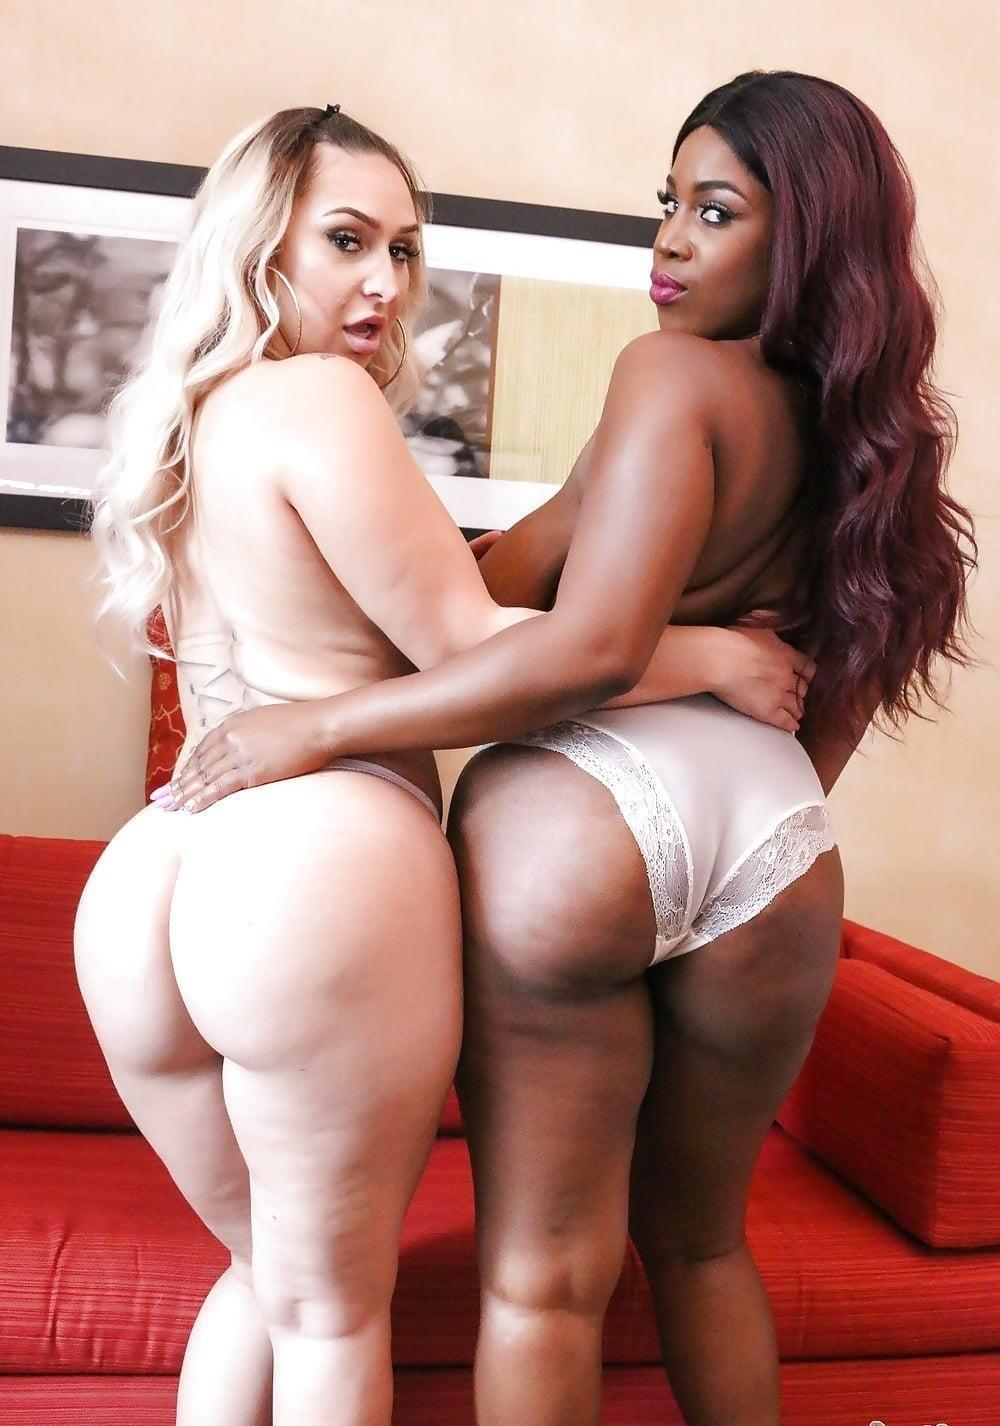 Curvy lesbian pics-4440